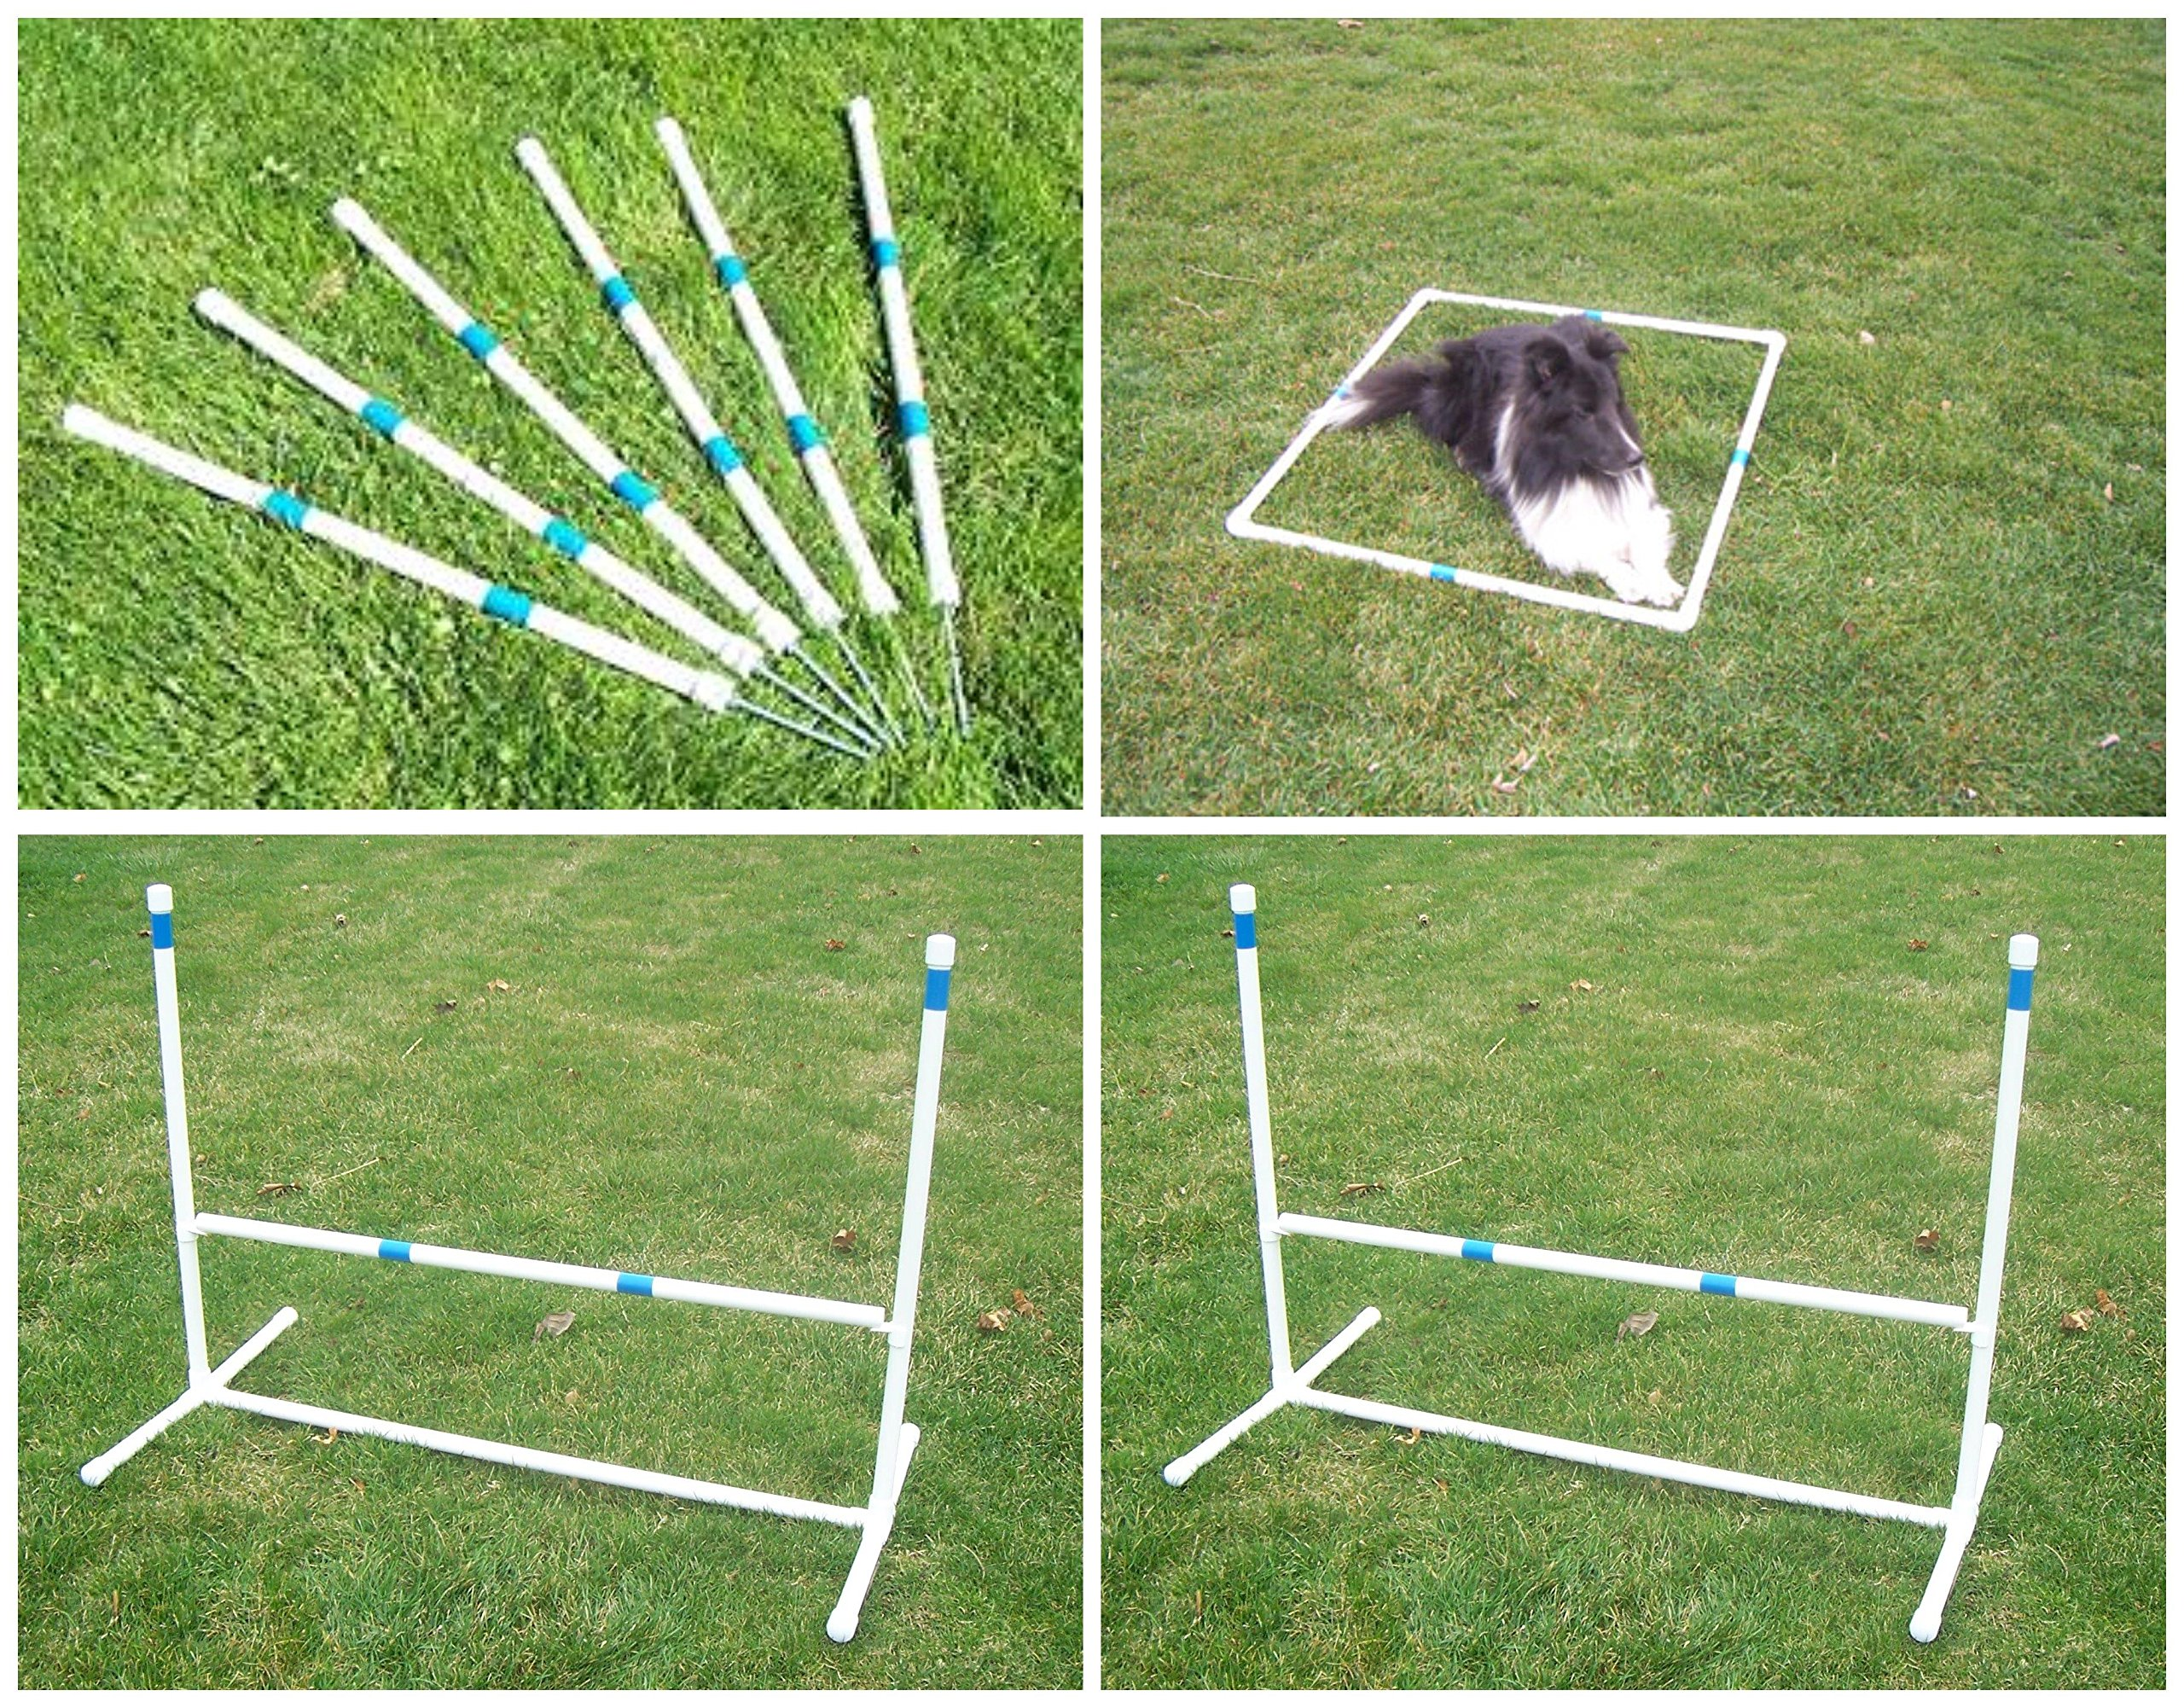 Agility Gear Outdoor Practice Set - I